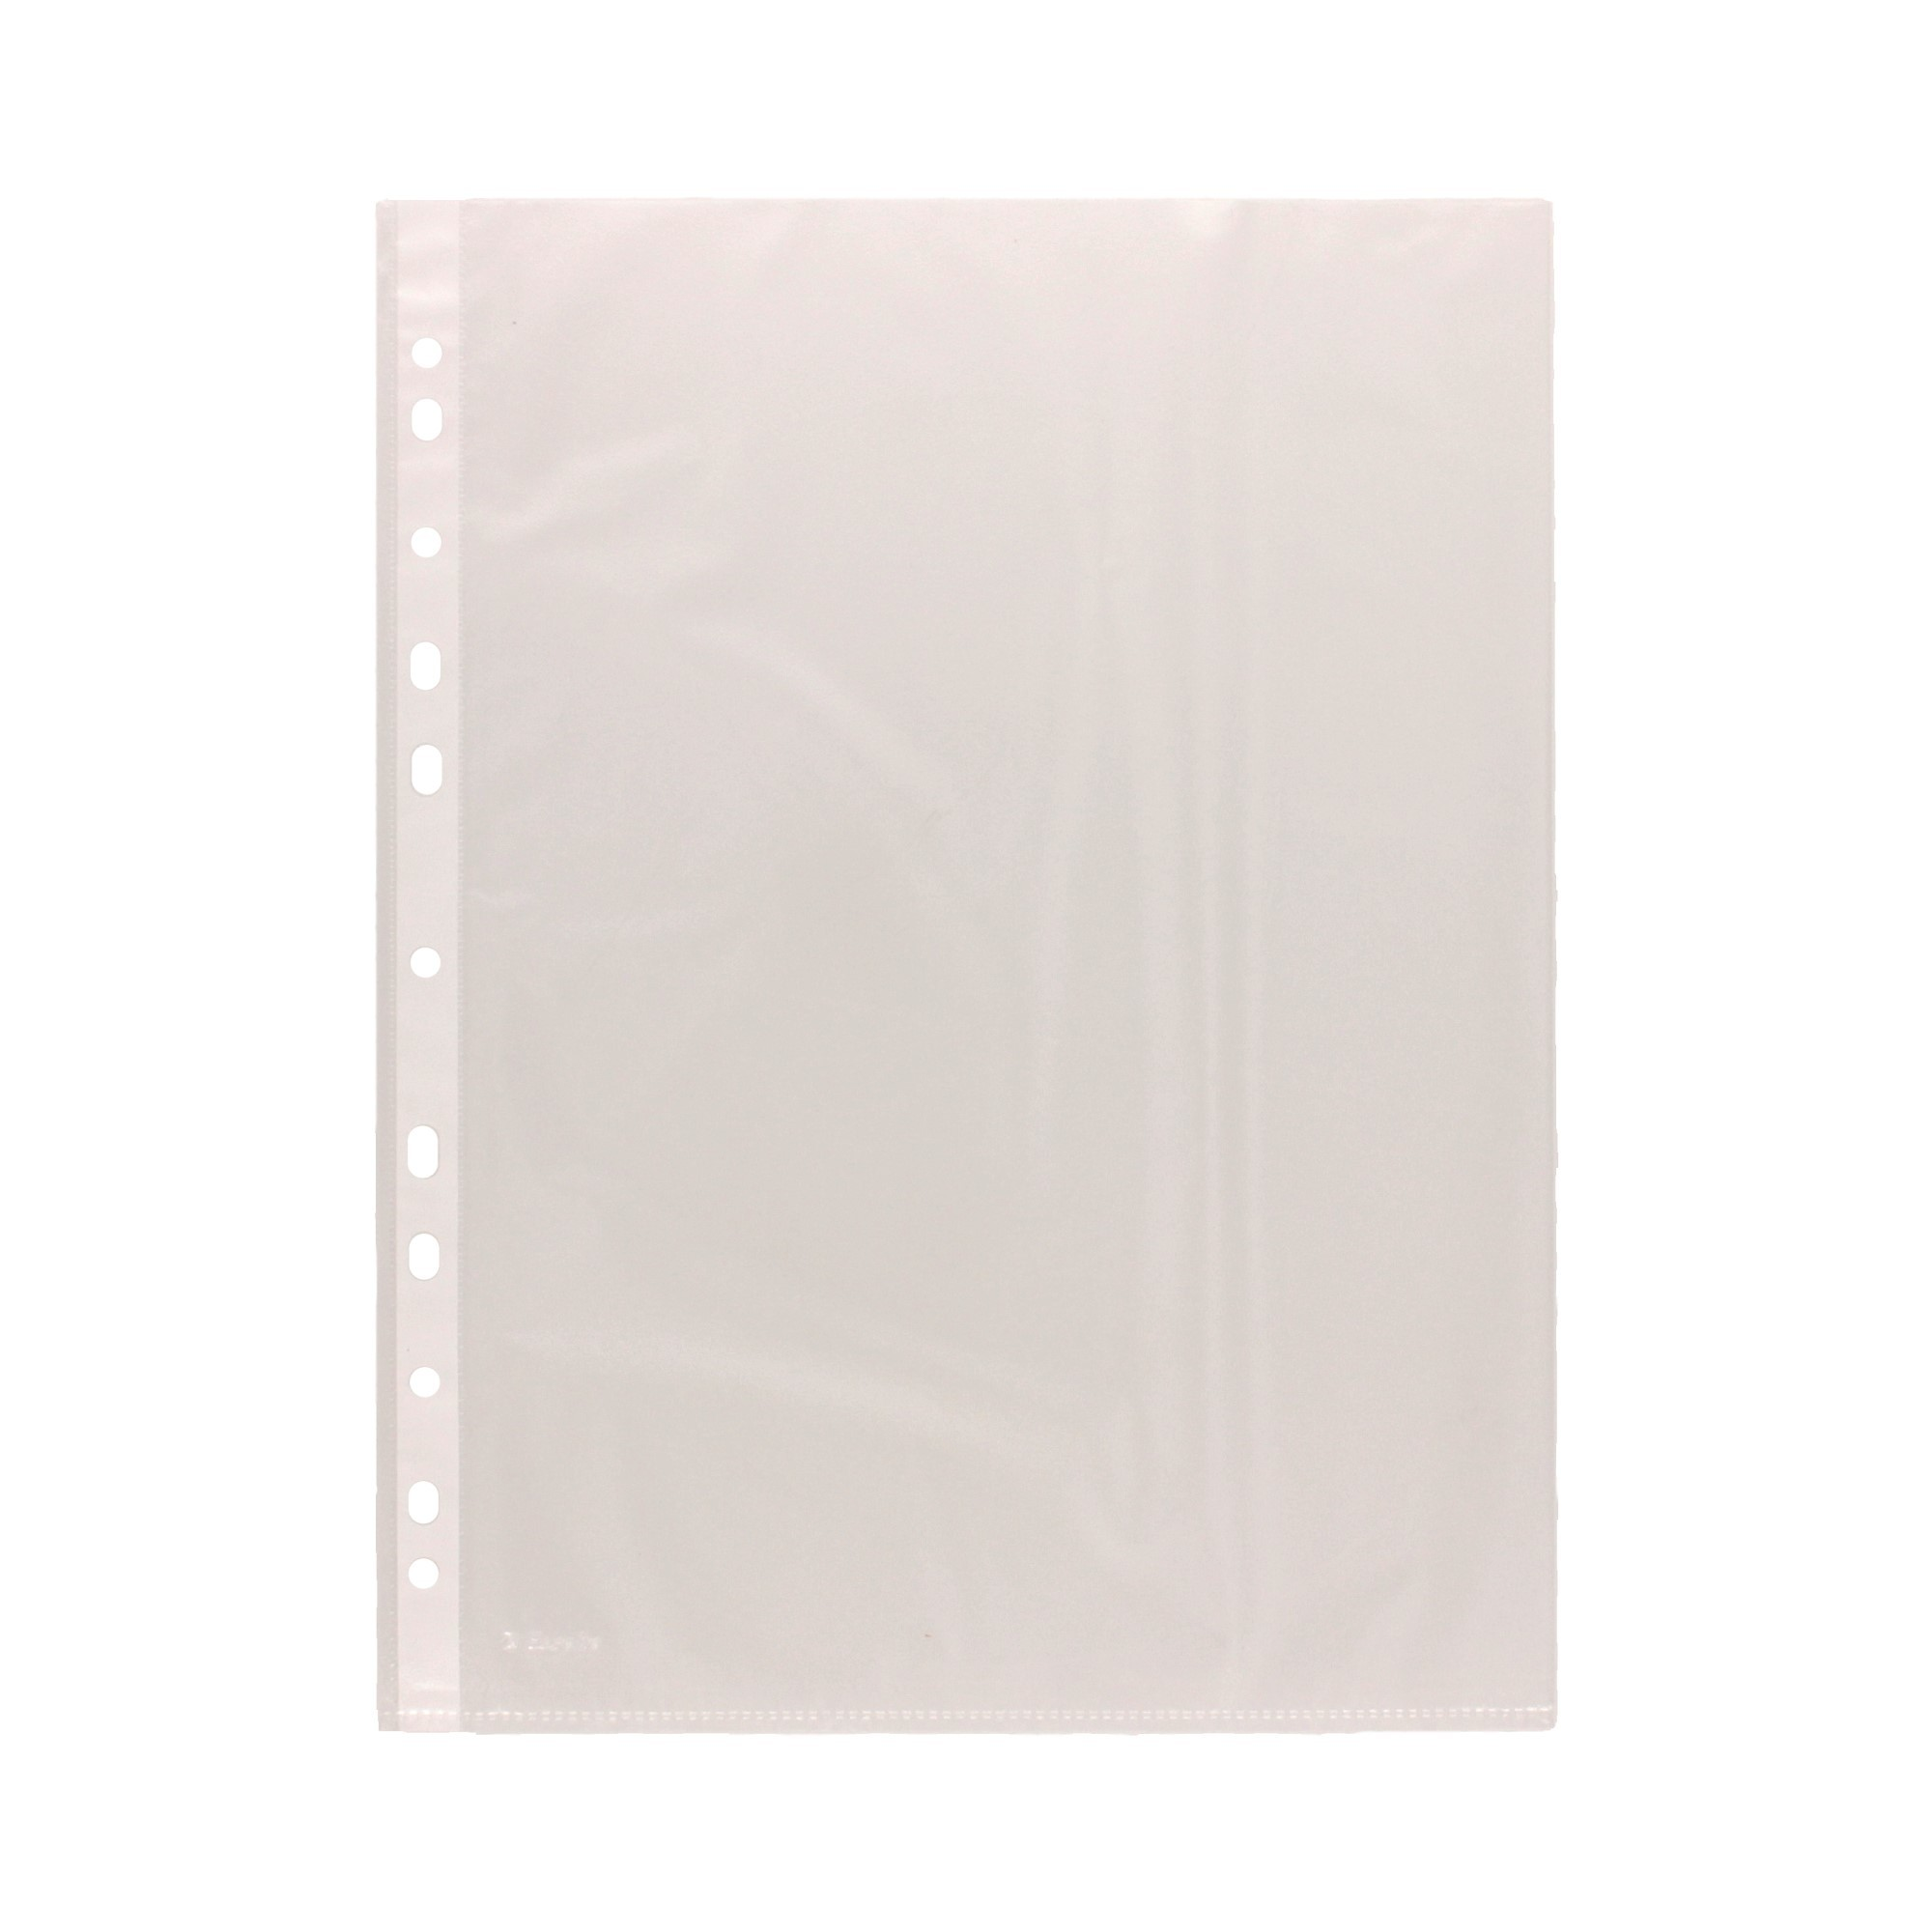 Koszulki groszkowe A4 (100)/folia 48mic 56171